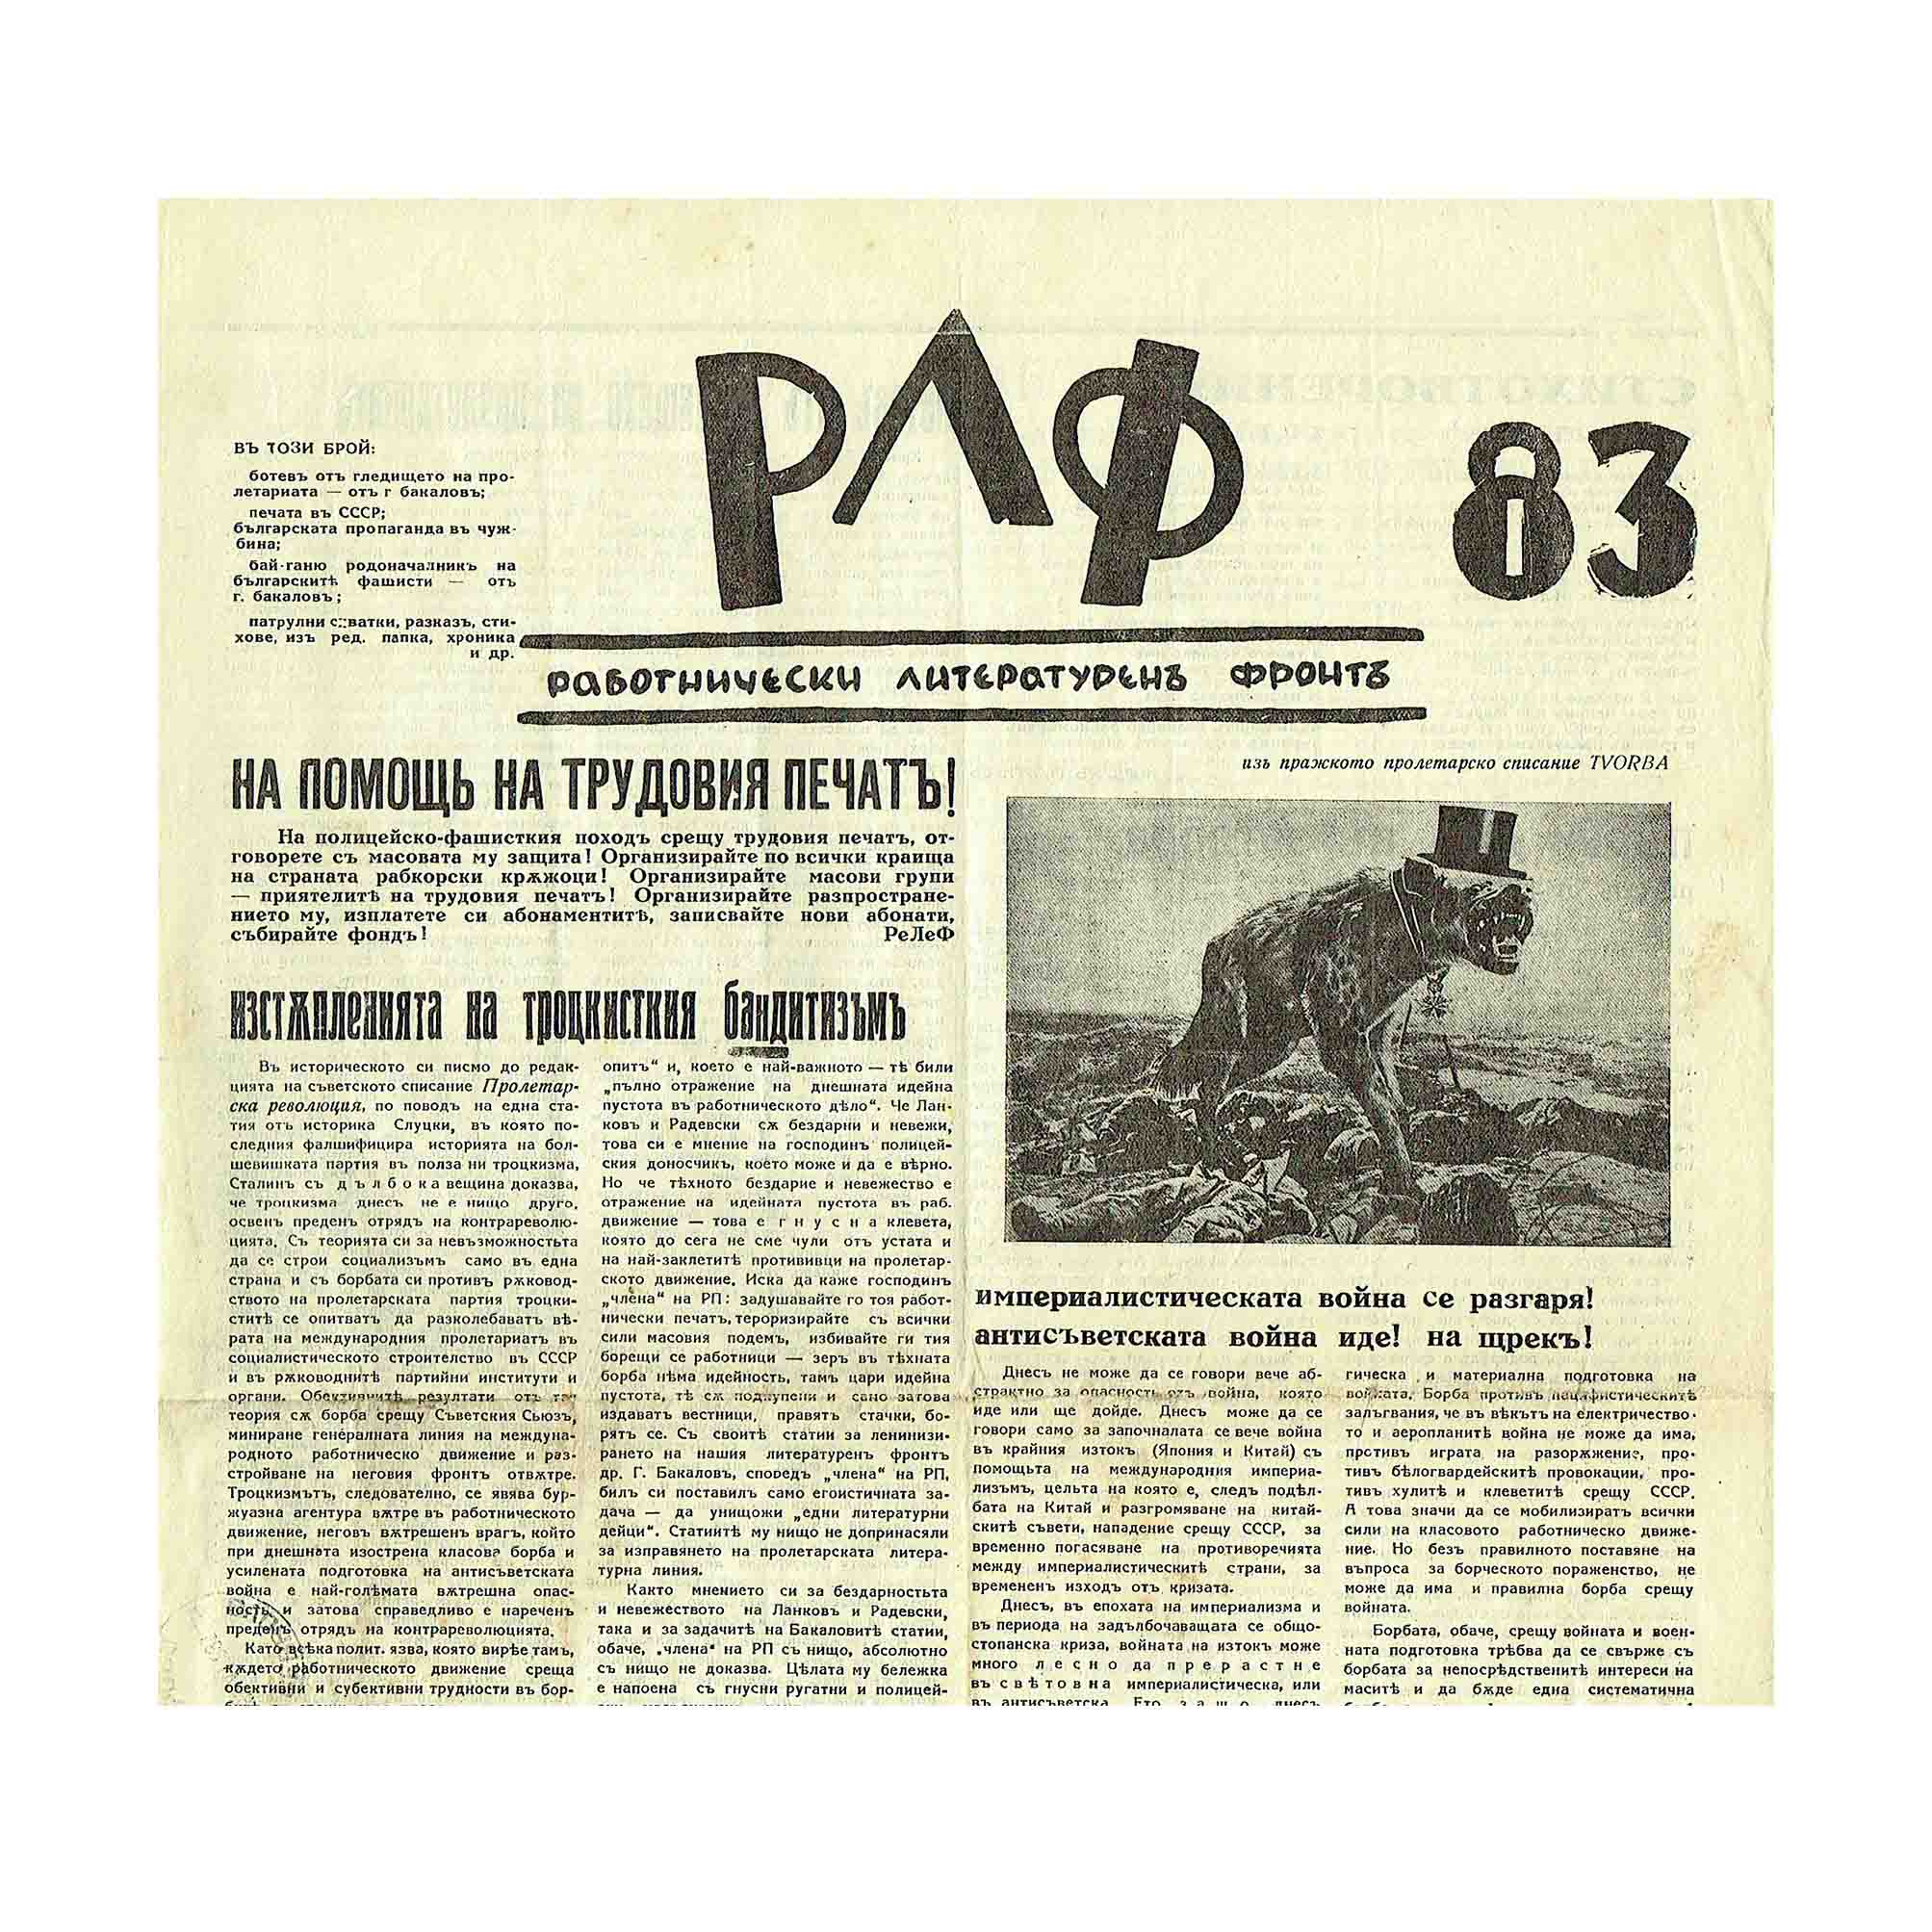 6080 Relef 3 83 1932 Heartfield Titelblatt A N